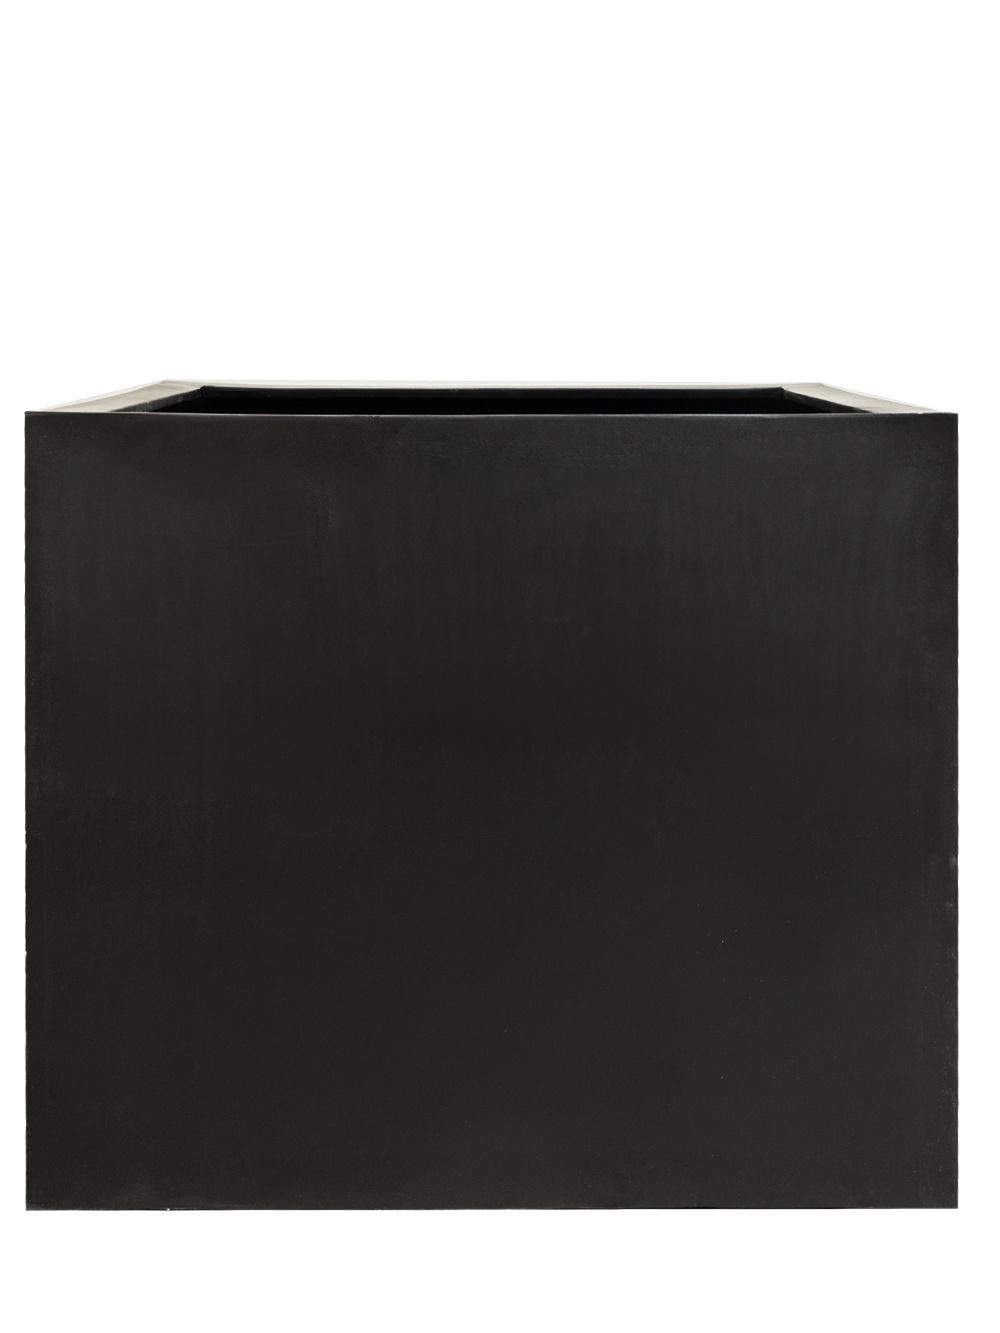 cube fiberglas blumenk bel in 85x100x100cm anthrazit. Black Bedroom Furniture Sets. Home Design Ideas